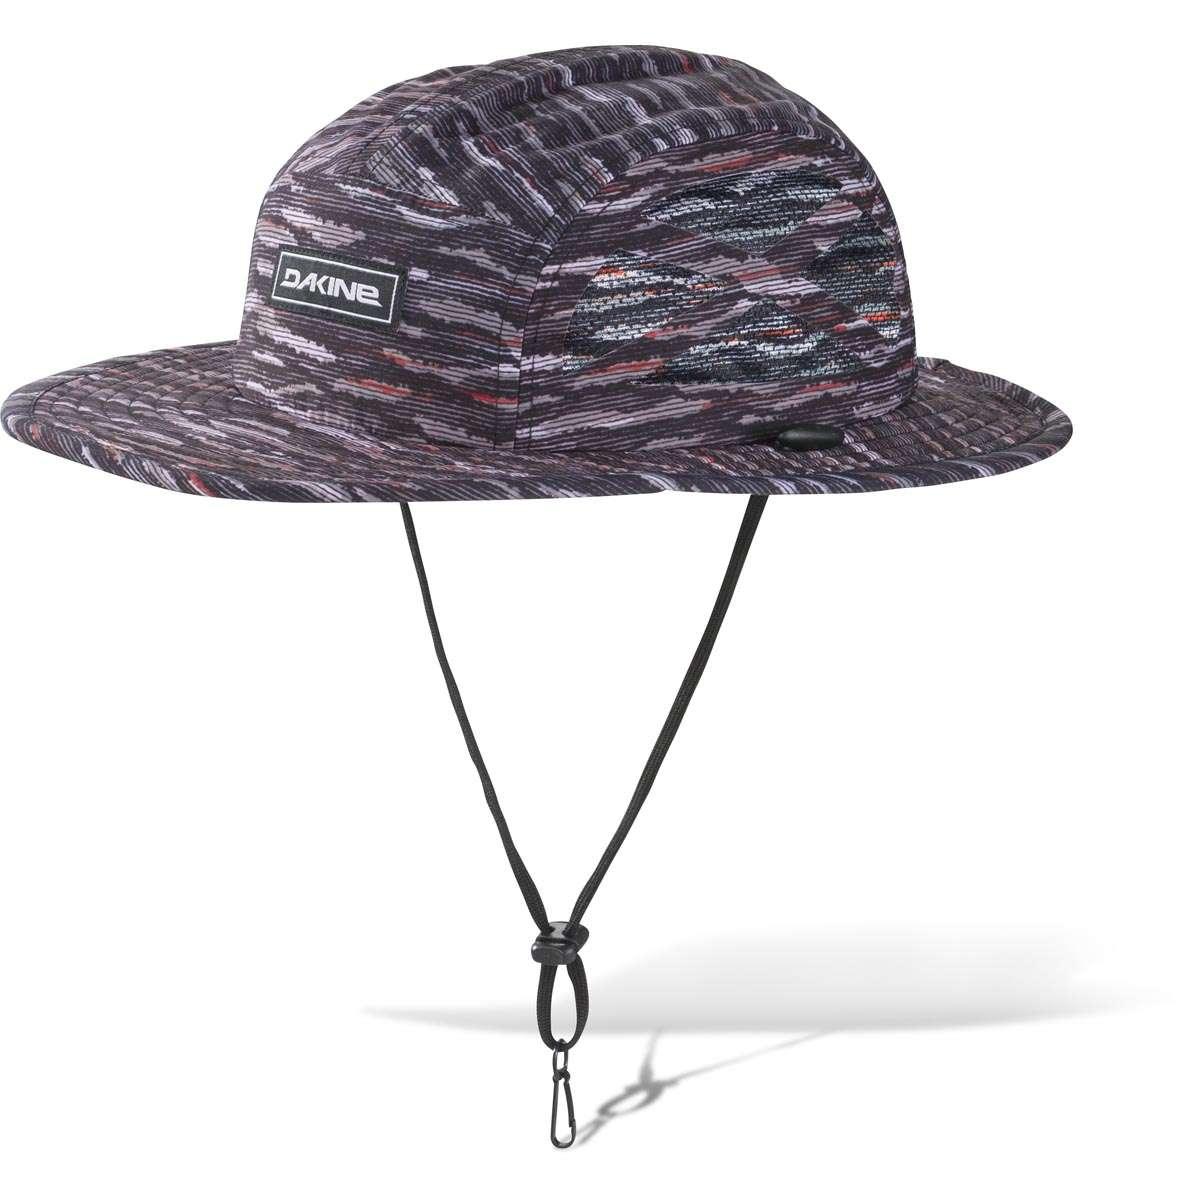 0c00521969a Dakine Kahu Surf Hat Hut Static